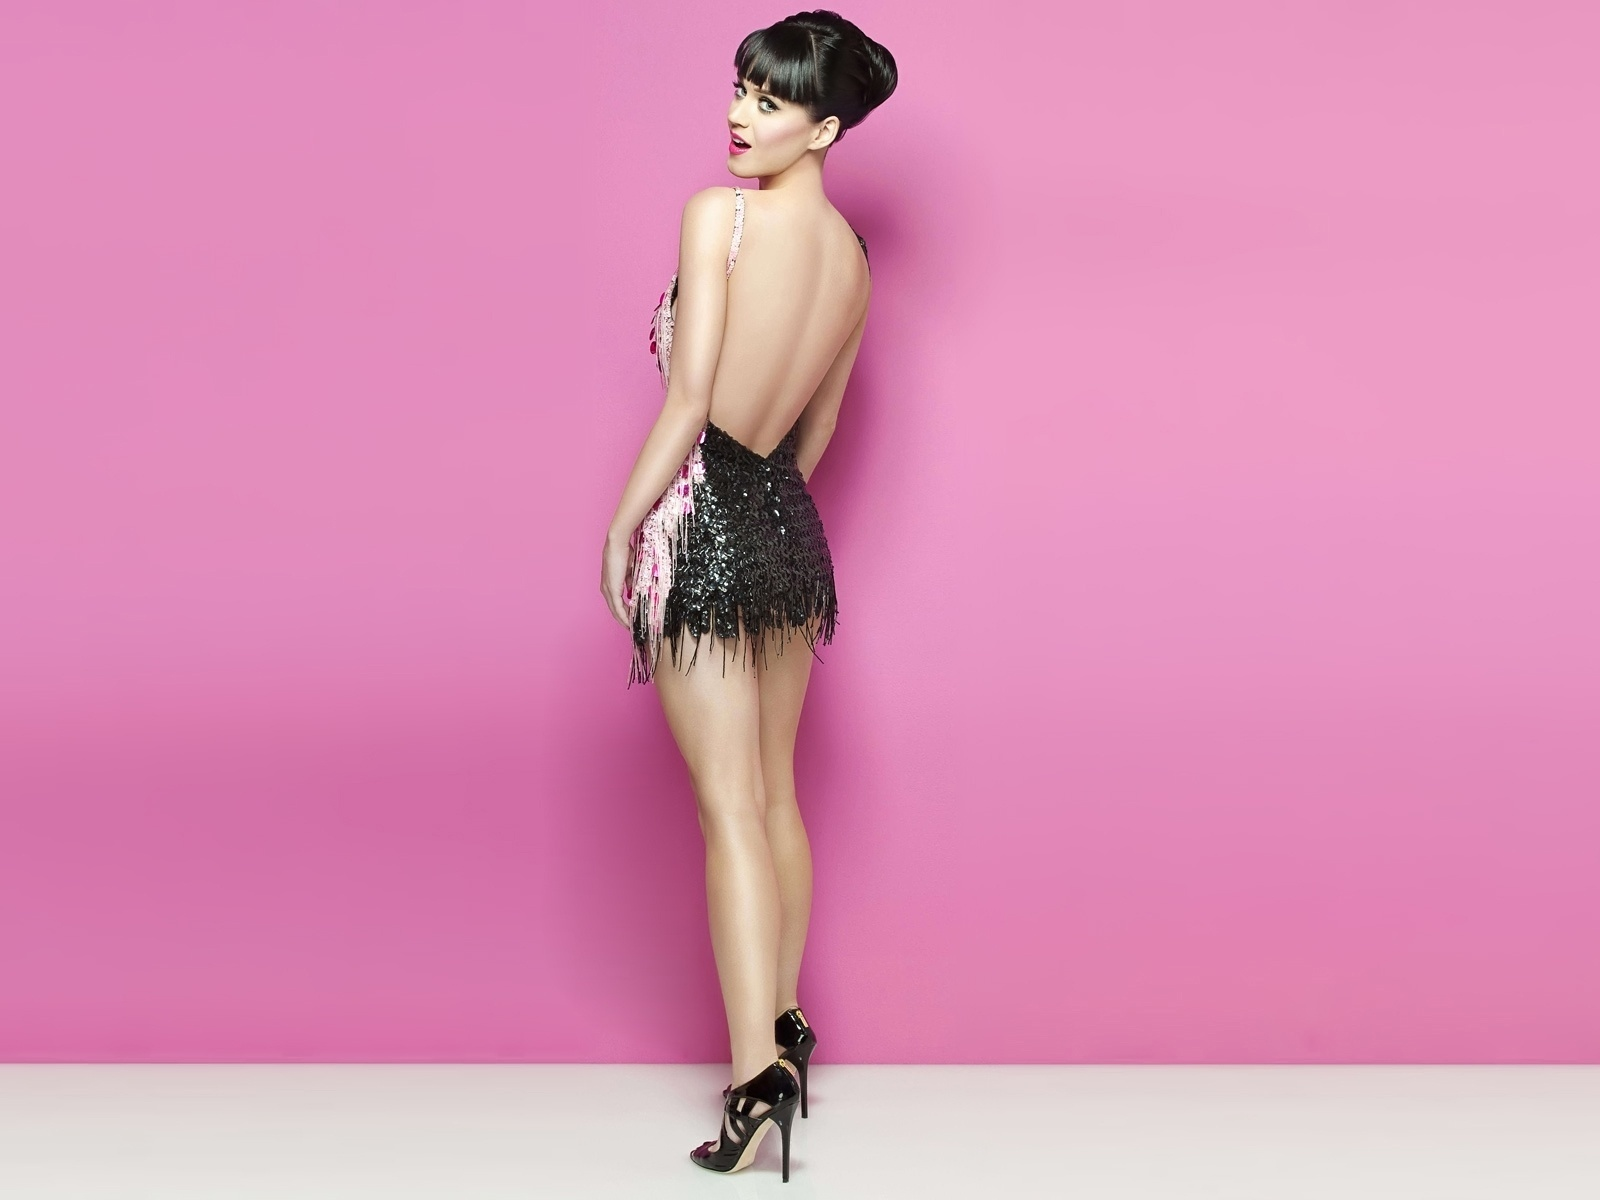 http://4.bp.blogspot.com/-LjDE4hPsEFM/TZZitZJ_1WI/AAAAAAAAMQ8/Ip9cDBj_R0c/s1600/katy-perry-sexy-wallpapers_21293_1600x1200.jpg